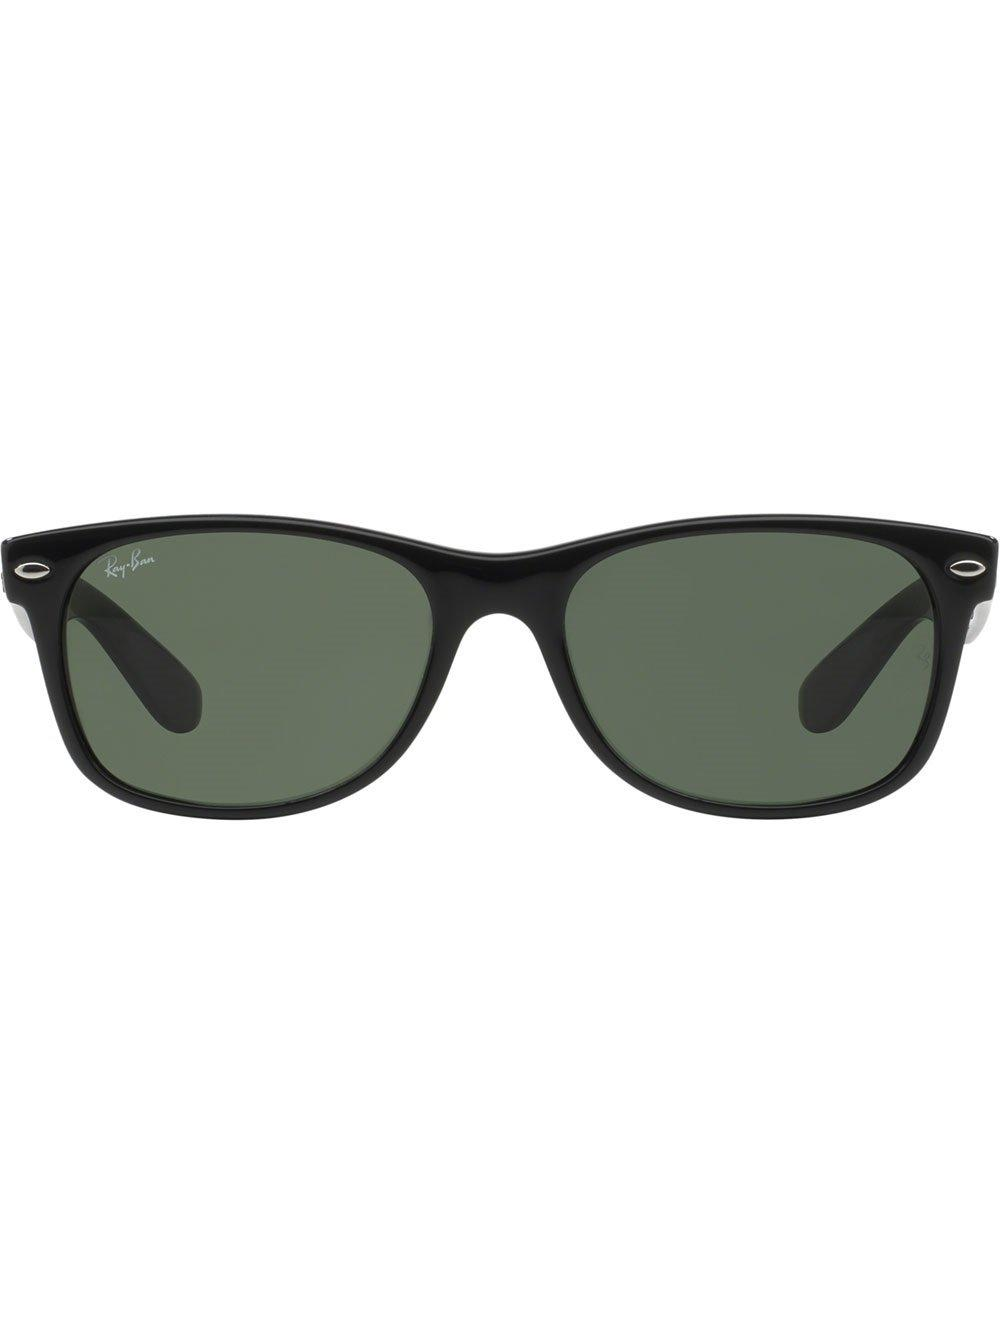 Ray Ban Ray-ban 'new Wayfarer' Sunglasses - Black